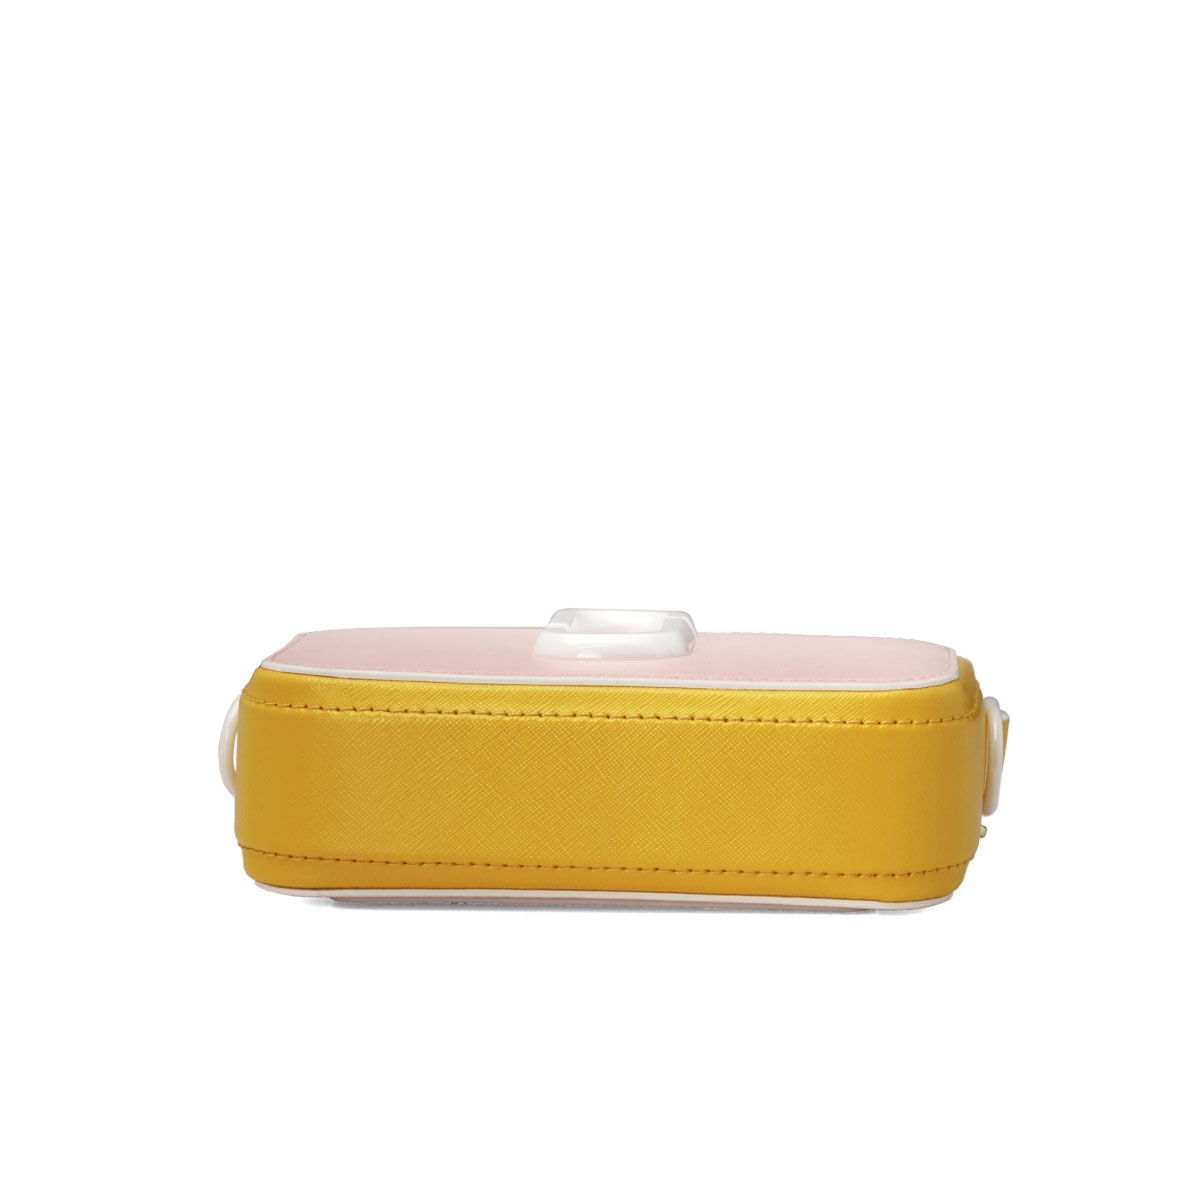 0e4efc55418 importshopdouble: Mark Jacobs MARC JACOBS bag lady M0014889 698 shoulder  bag SNAPSHOT CERAMIC snapshot ceramic BLUSH MULTI pink | Rakuten Global  Market